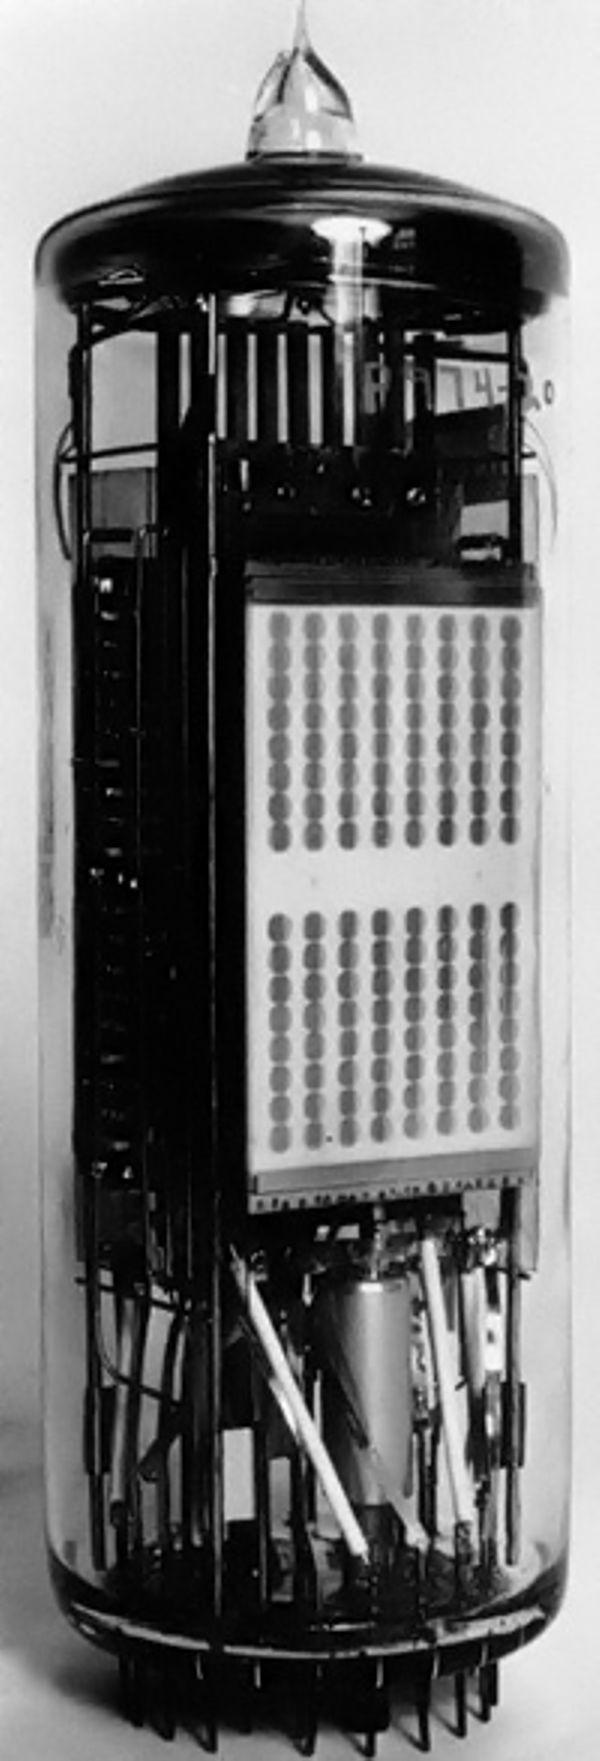 Computer Inventor Rajchman Born